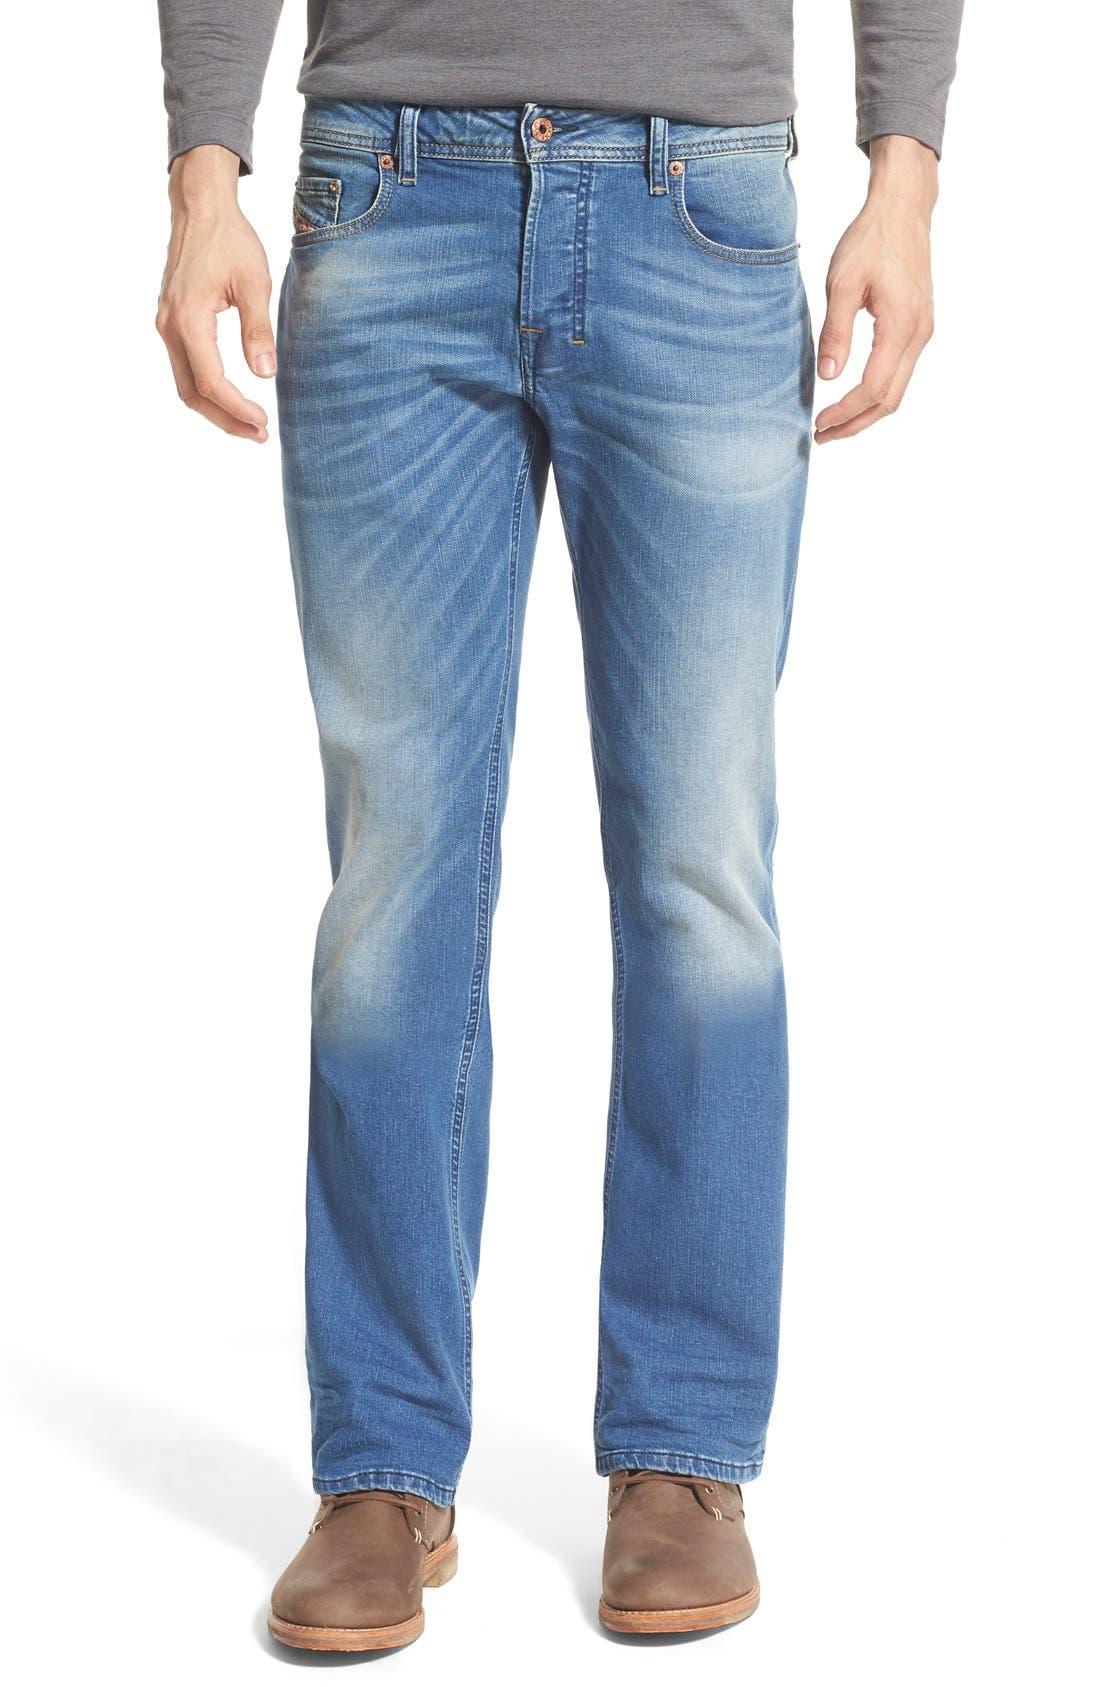 'Zatiny' Bootcut Jeans,                             Main thumbnail 1, color,                             400